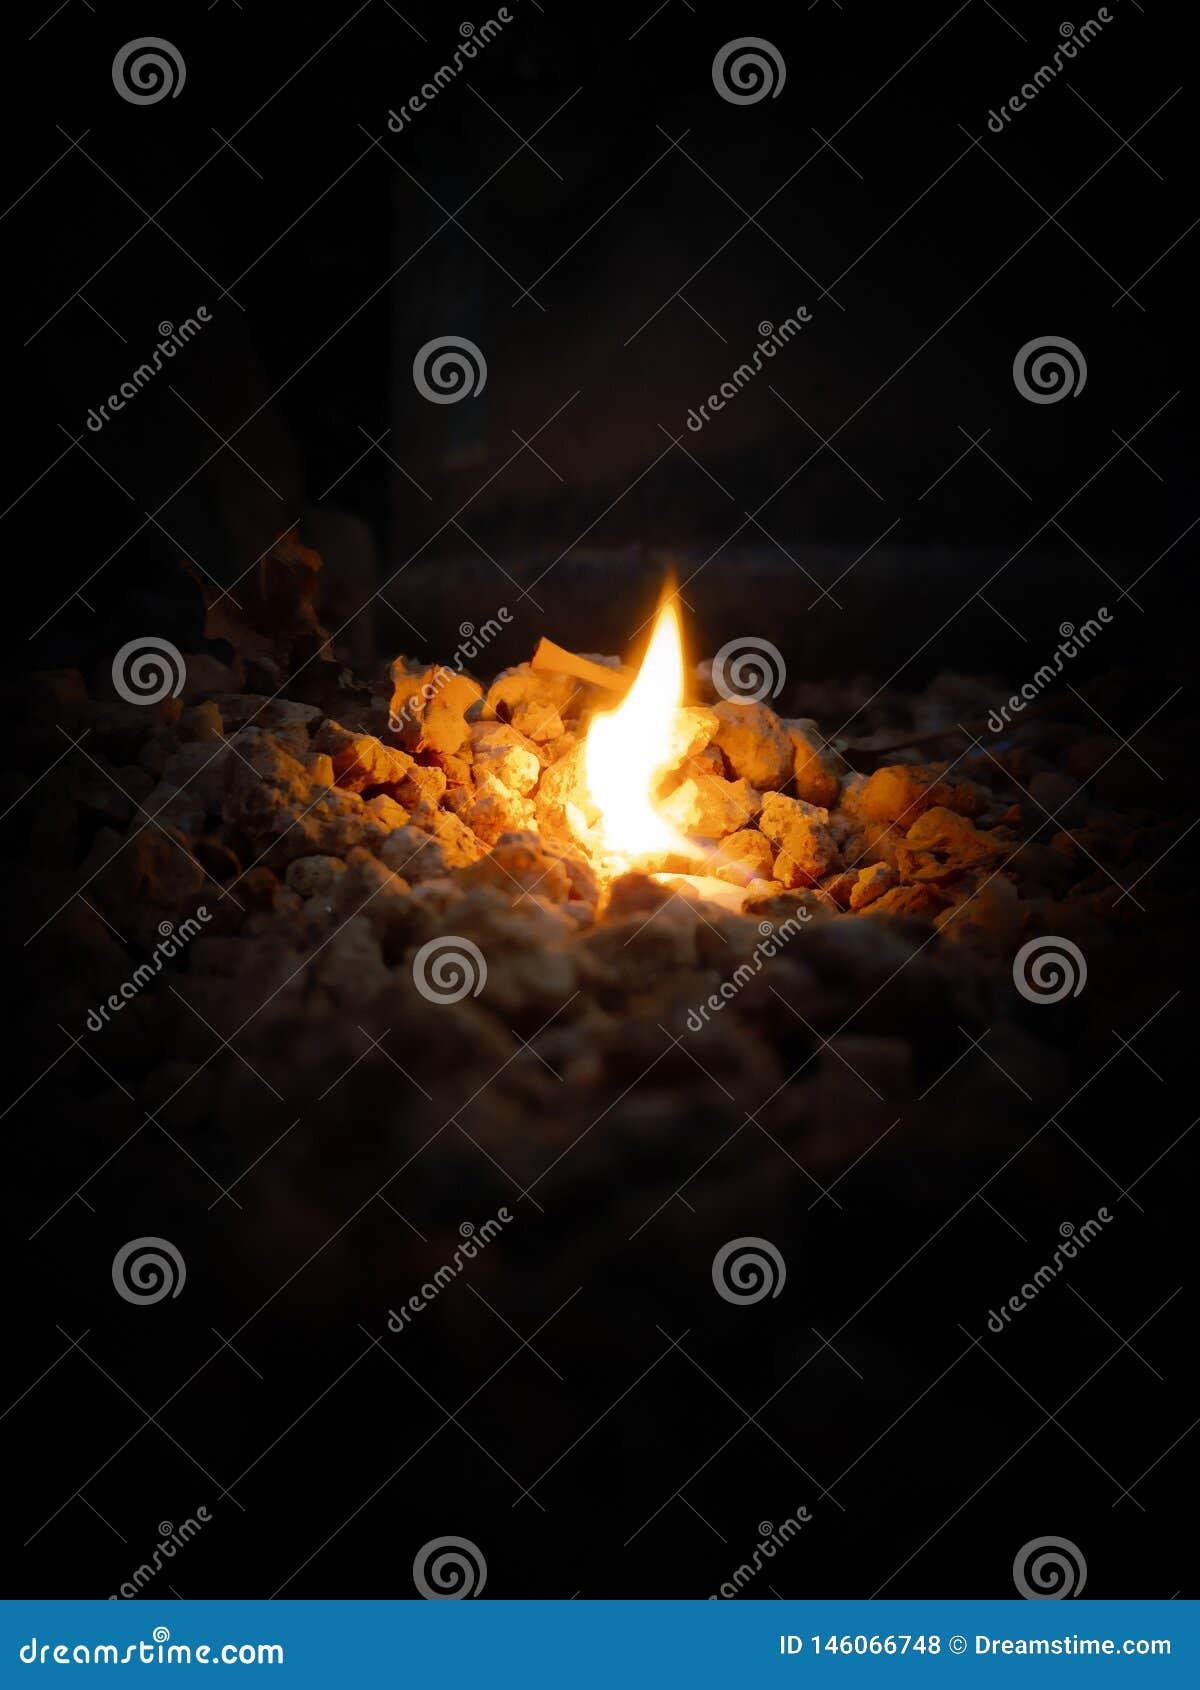 Фотография огня